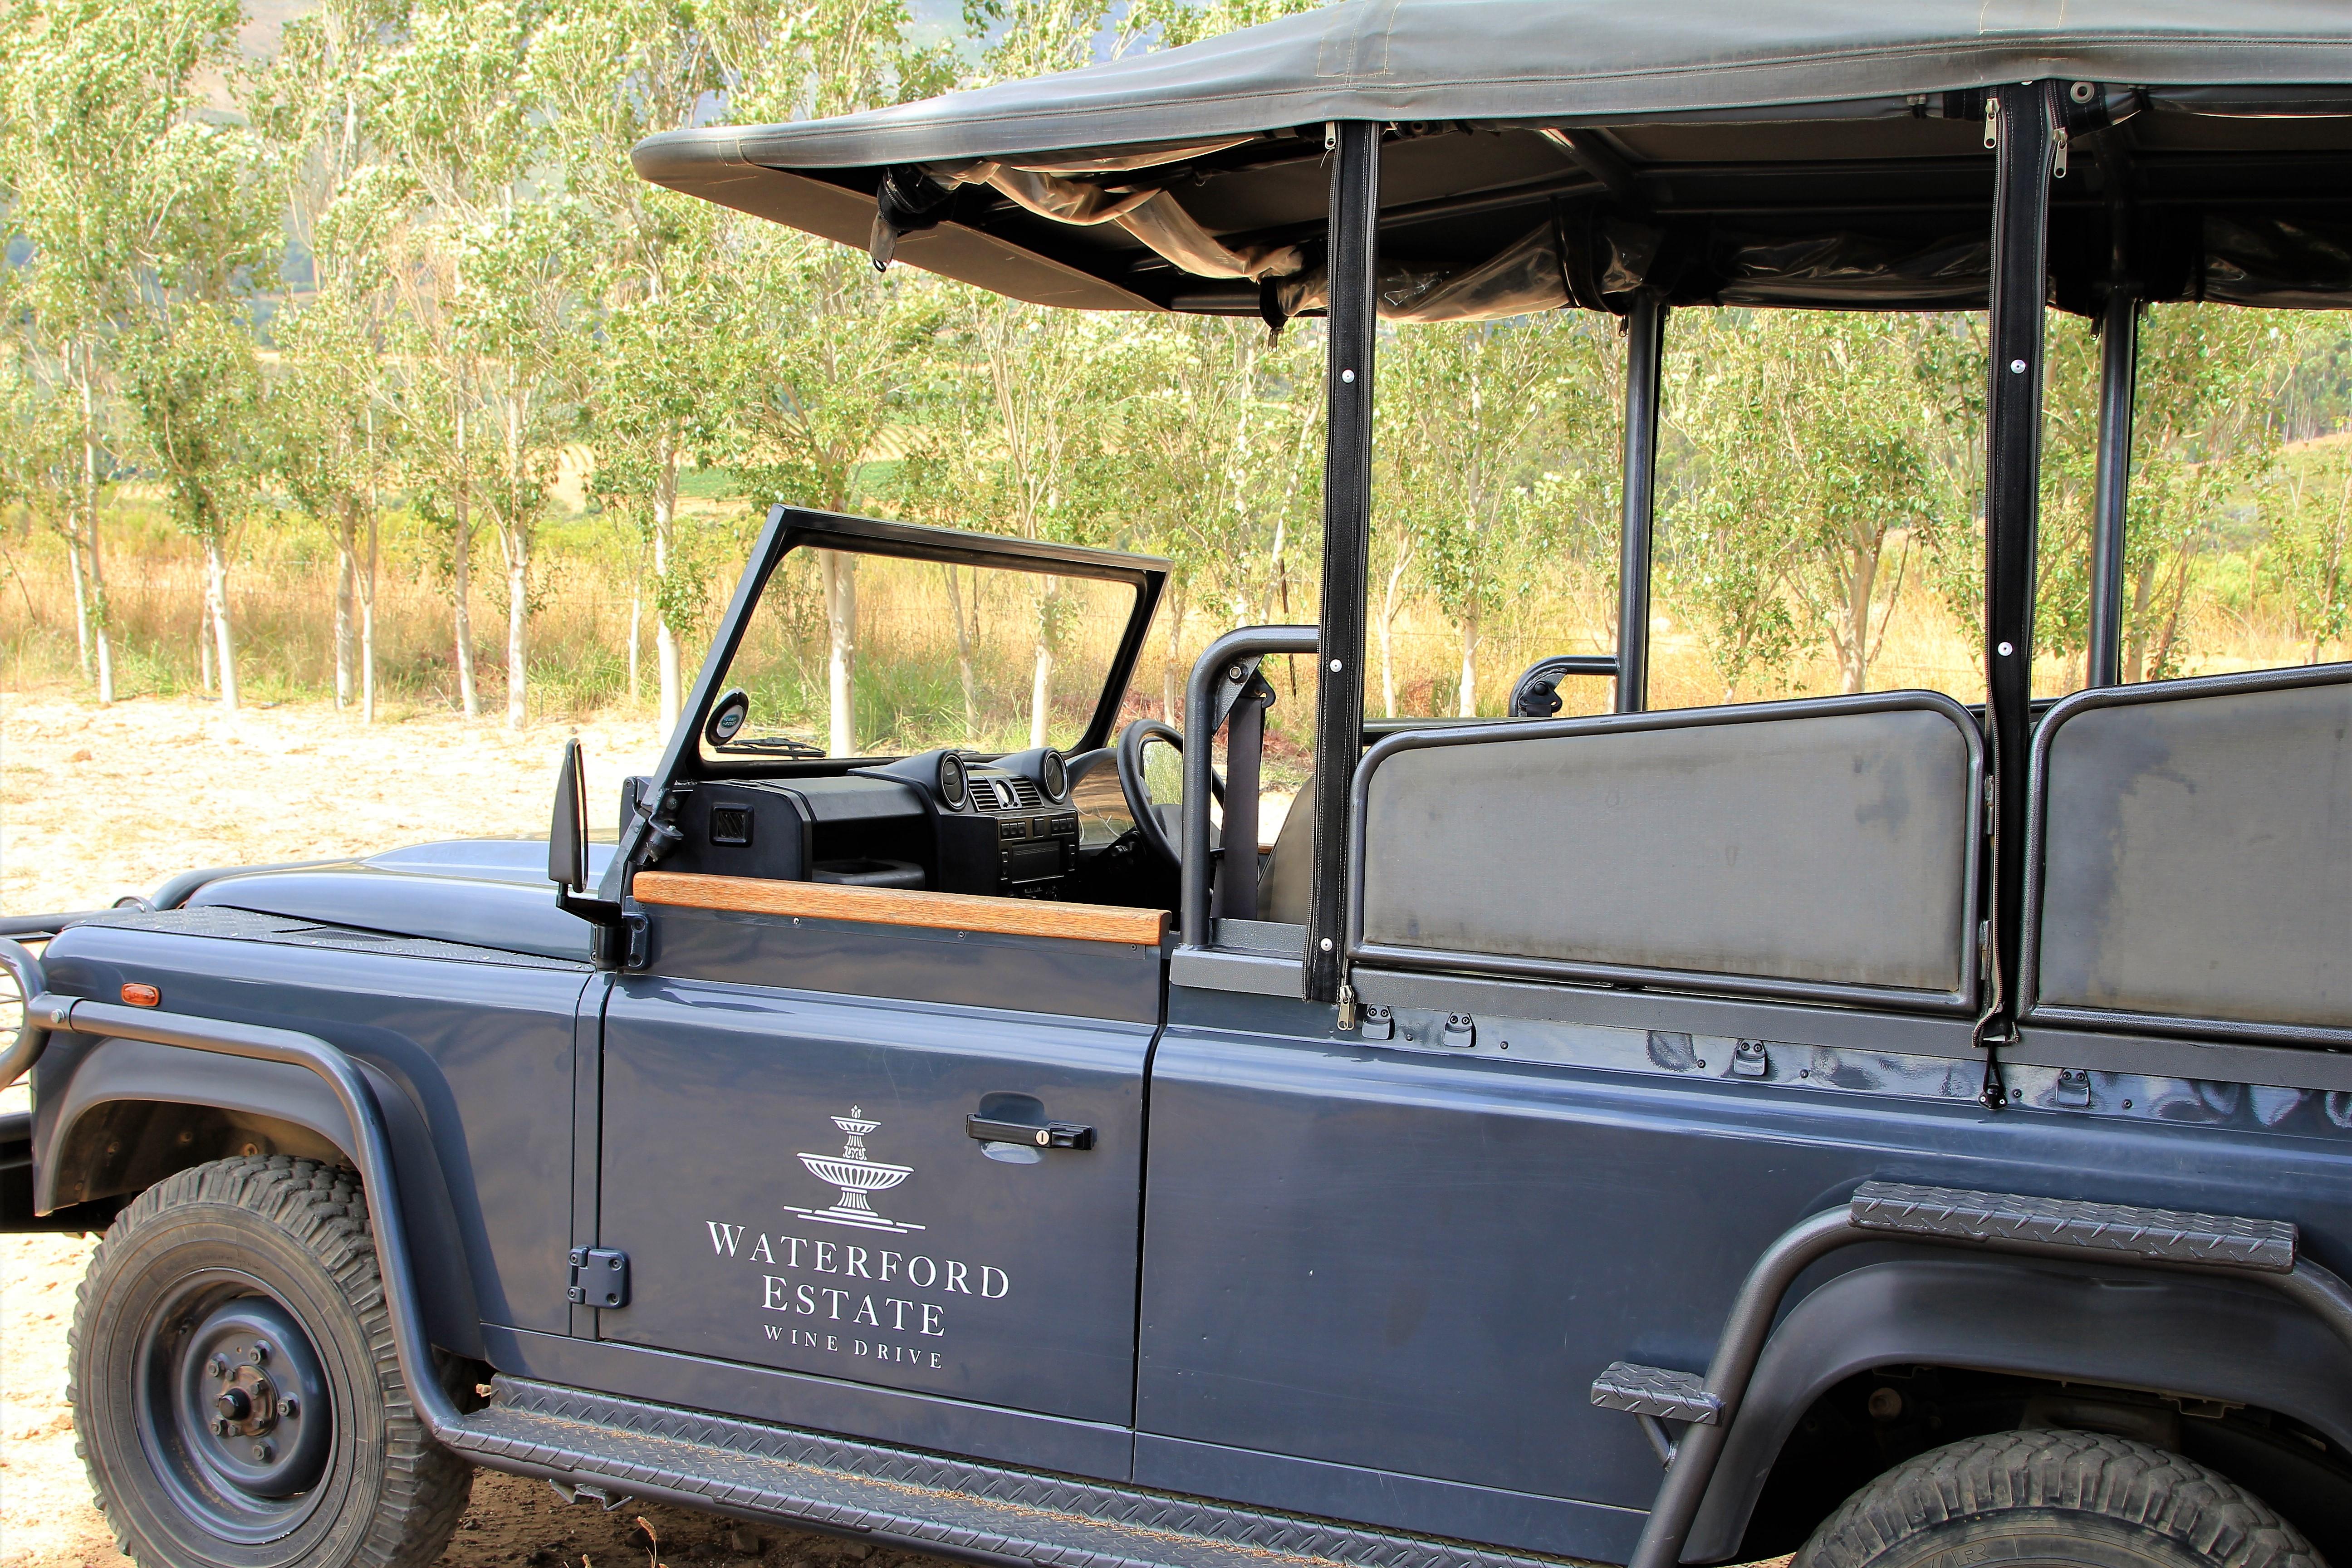 Wine safari - Waterford Estate